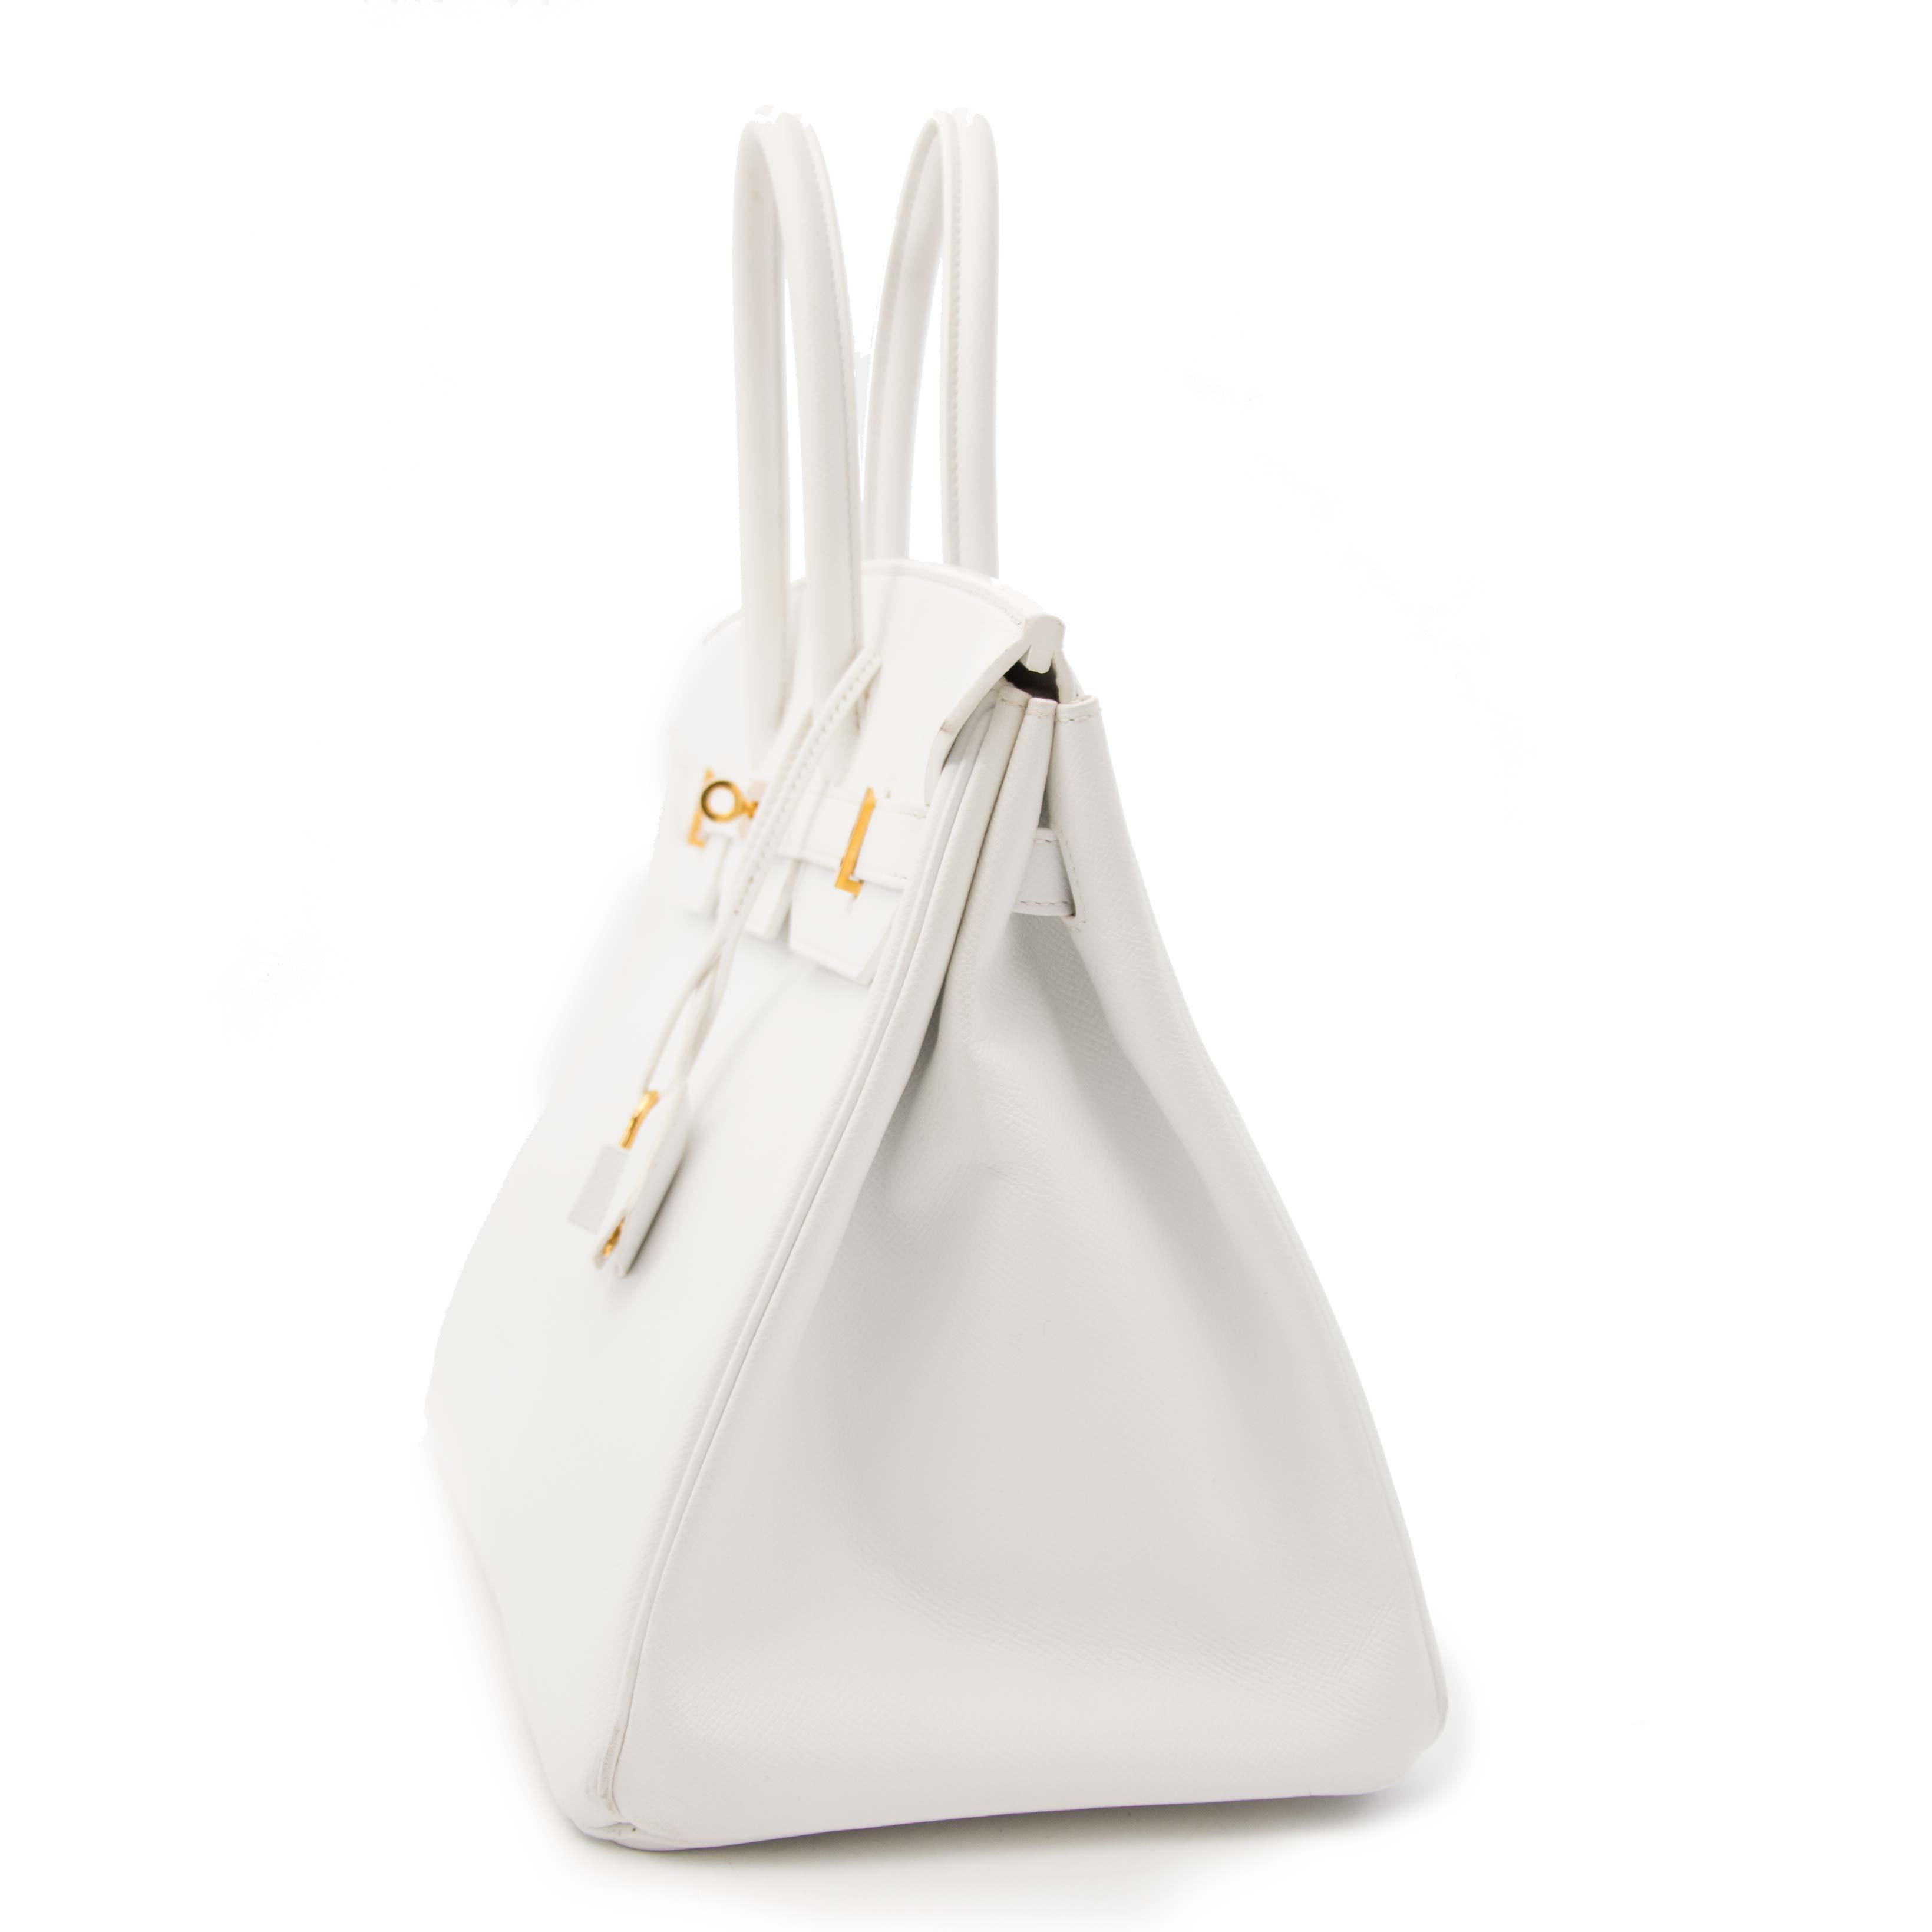 worldwide shipping skip the waitinglist Hard To Find Hermes White Epsom Birkin 35 GHW